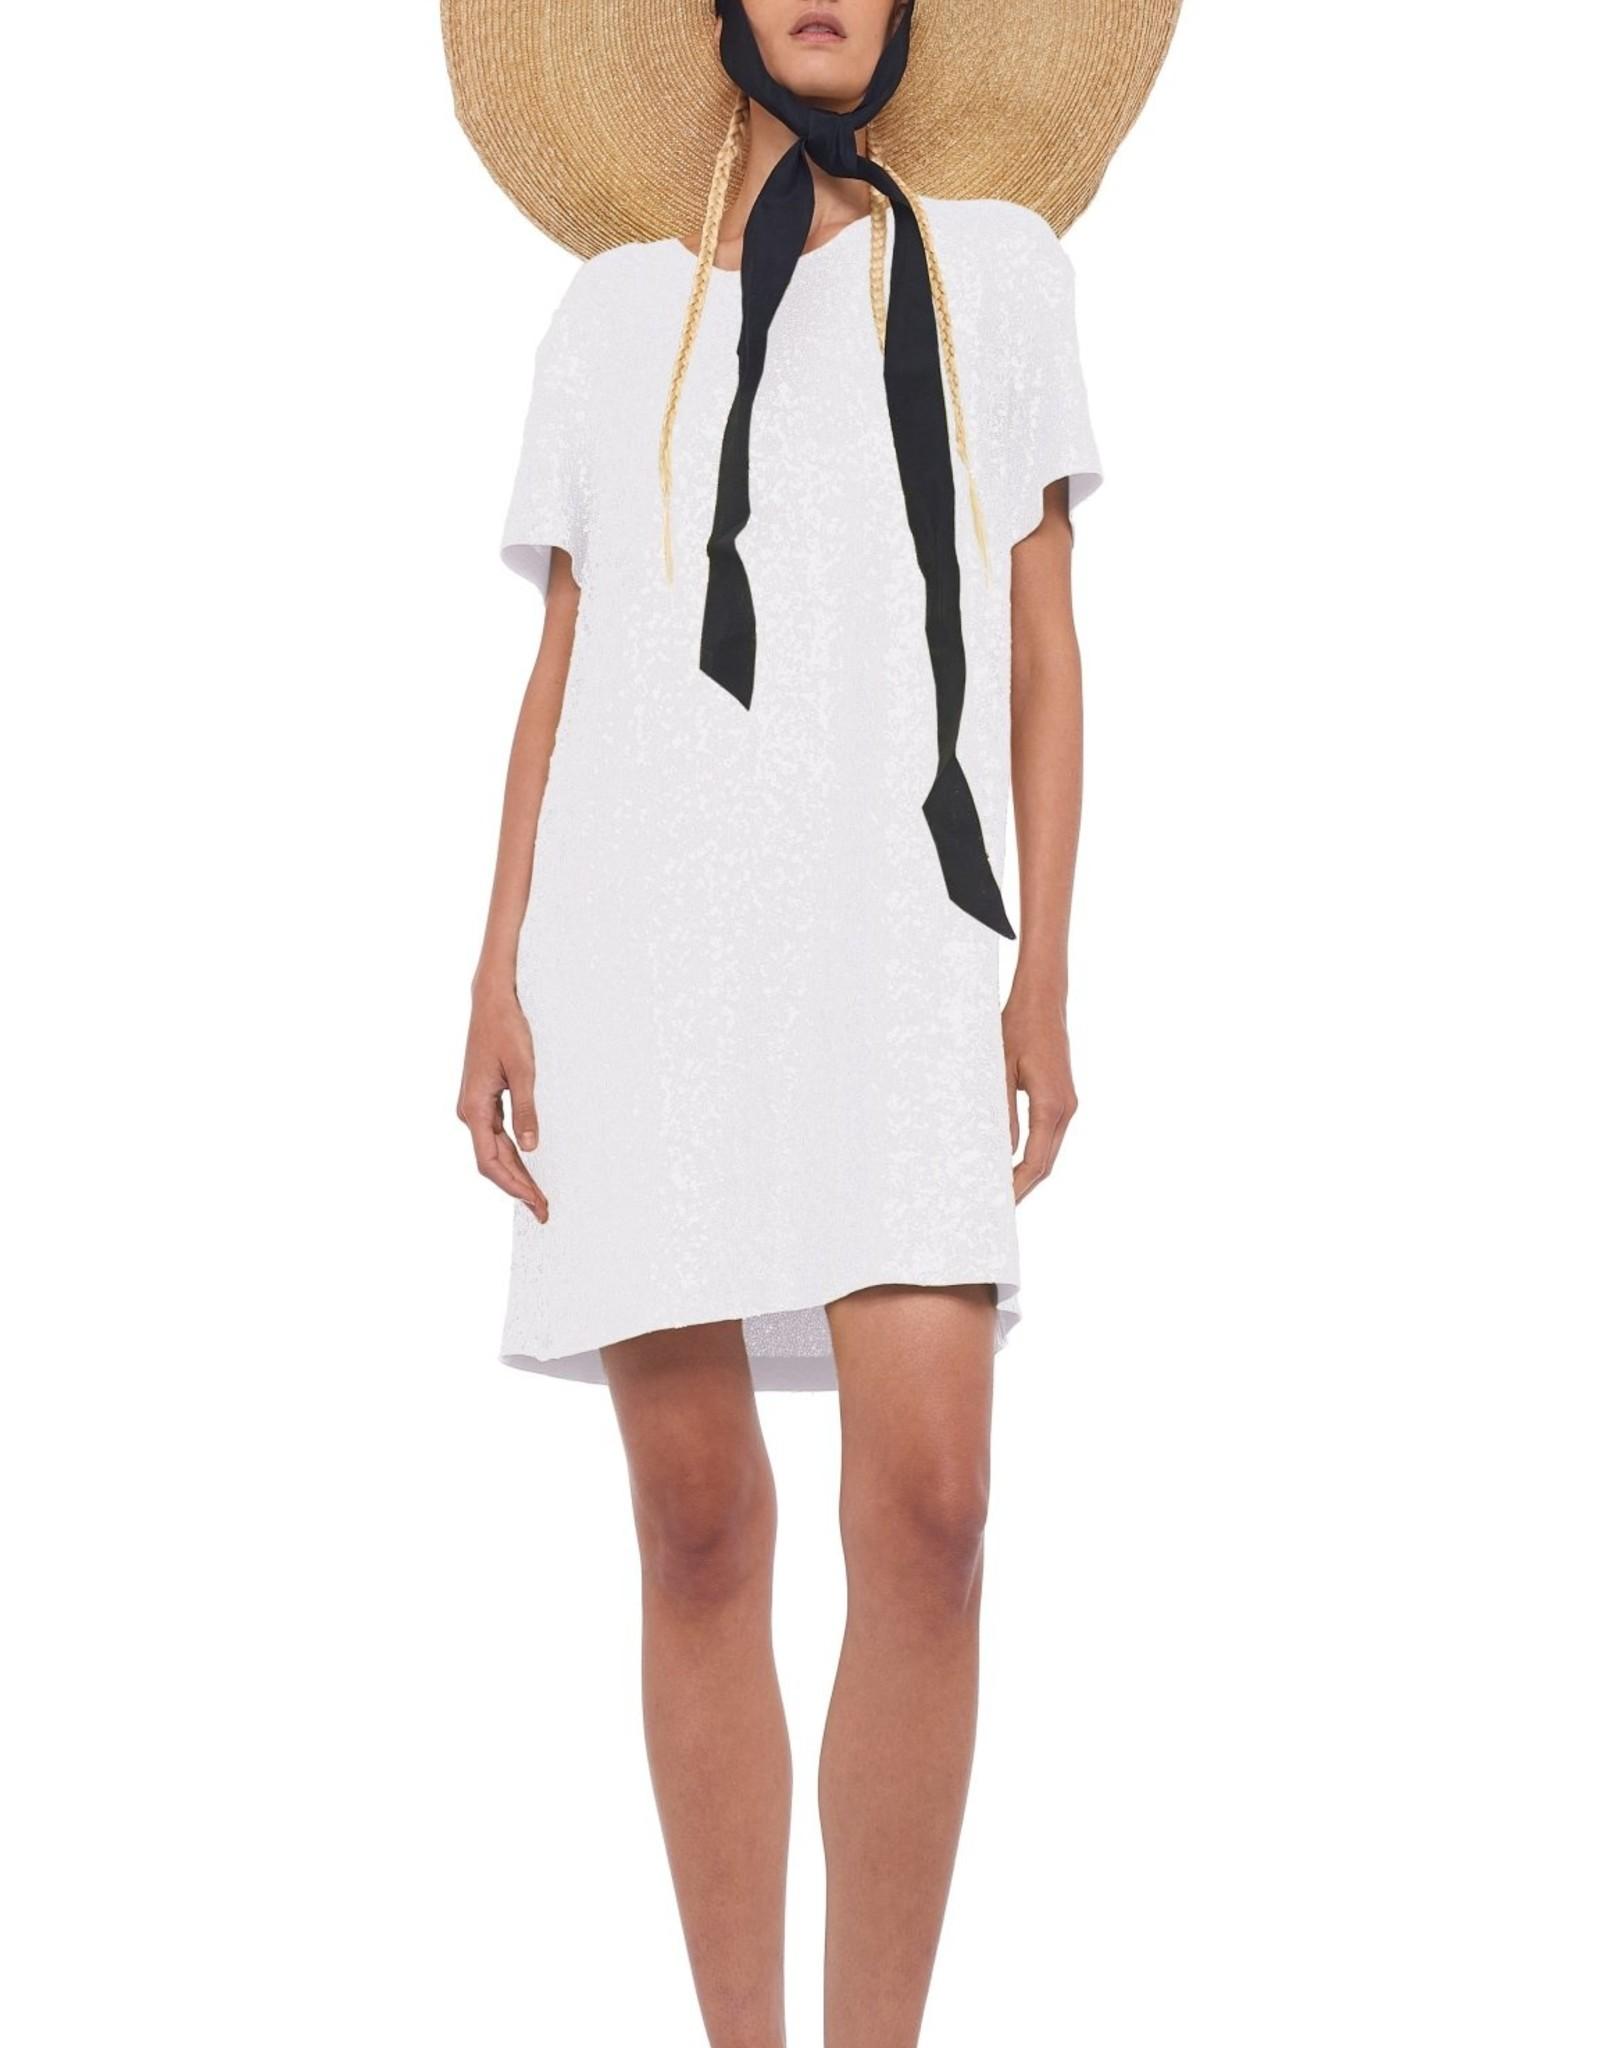 NORMA KAMALI The Sequin Boxy Dress